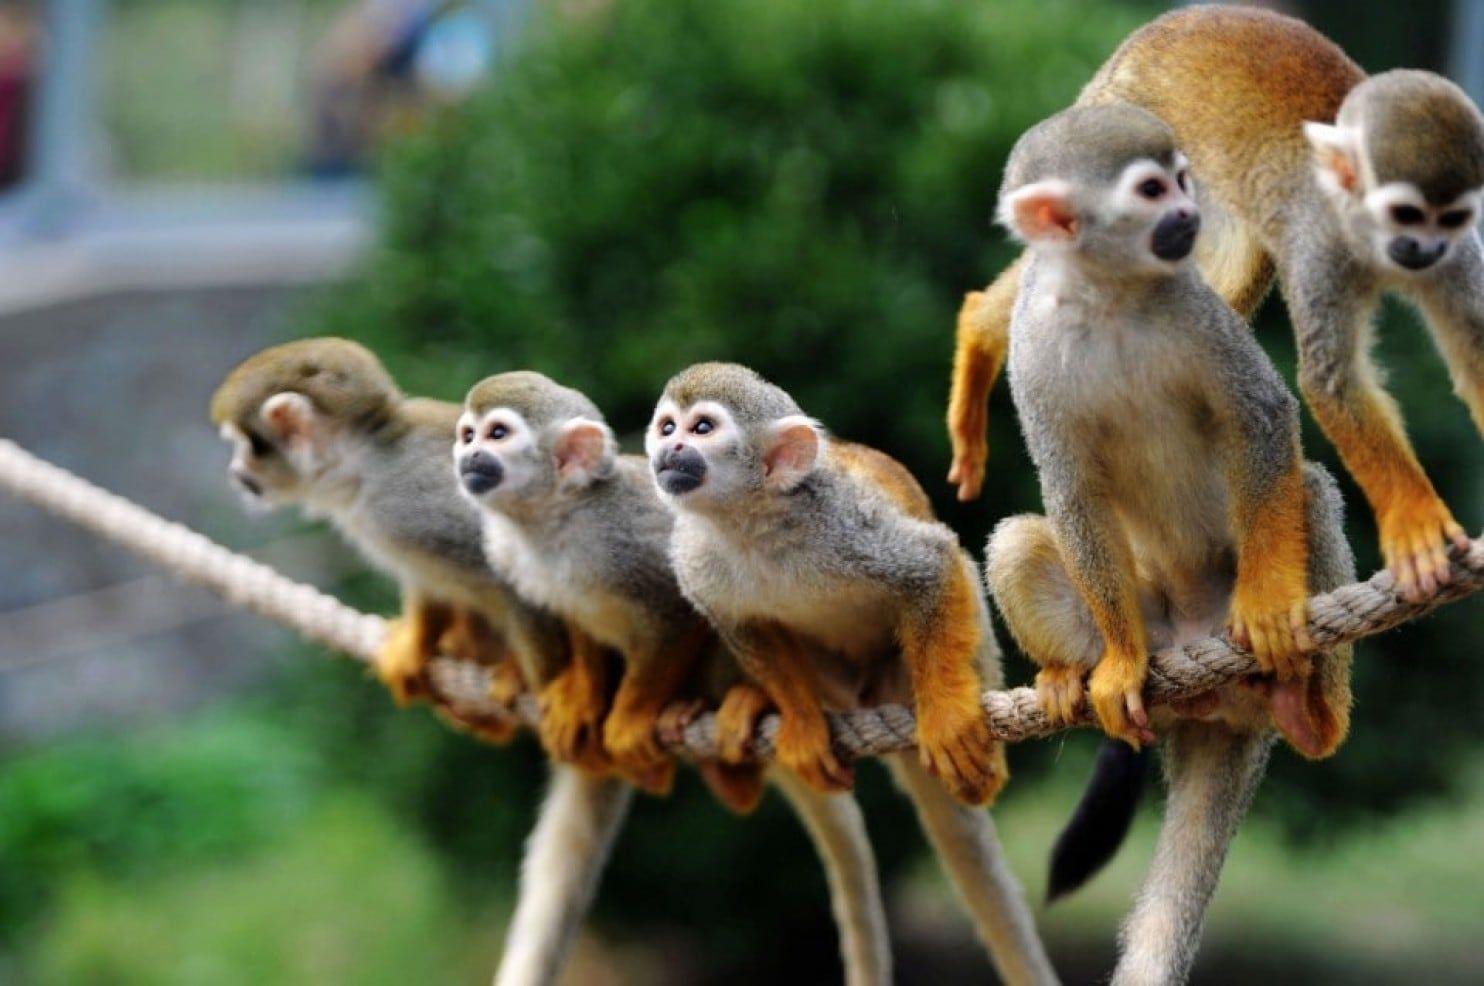 resume Resume Monkey fda halts monkey research denounced by jane goodall as shameful monkey